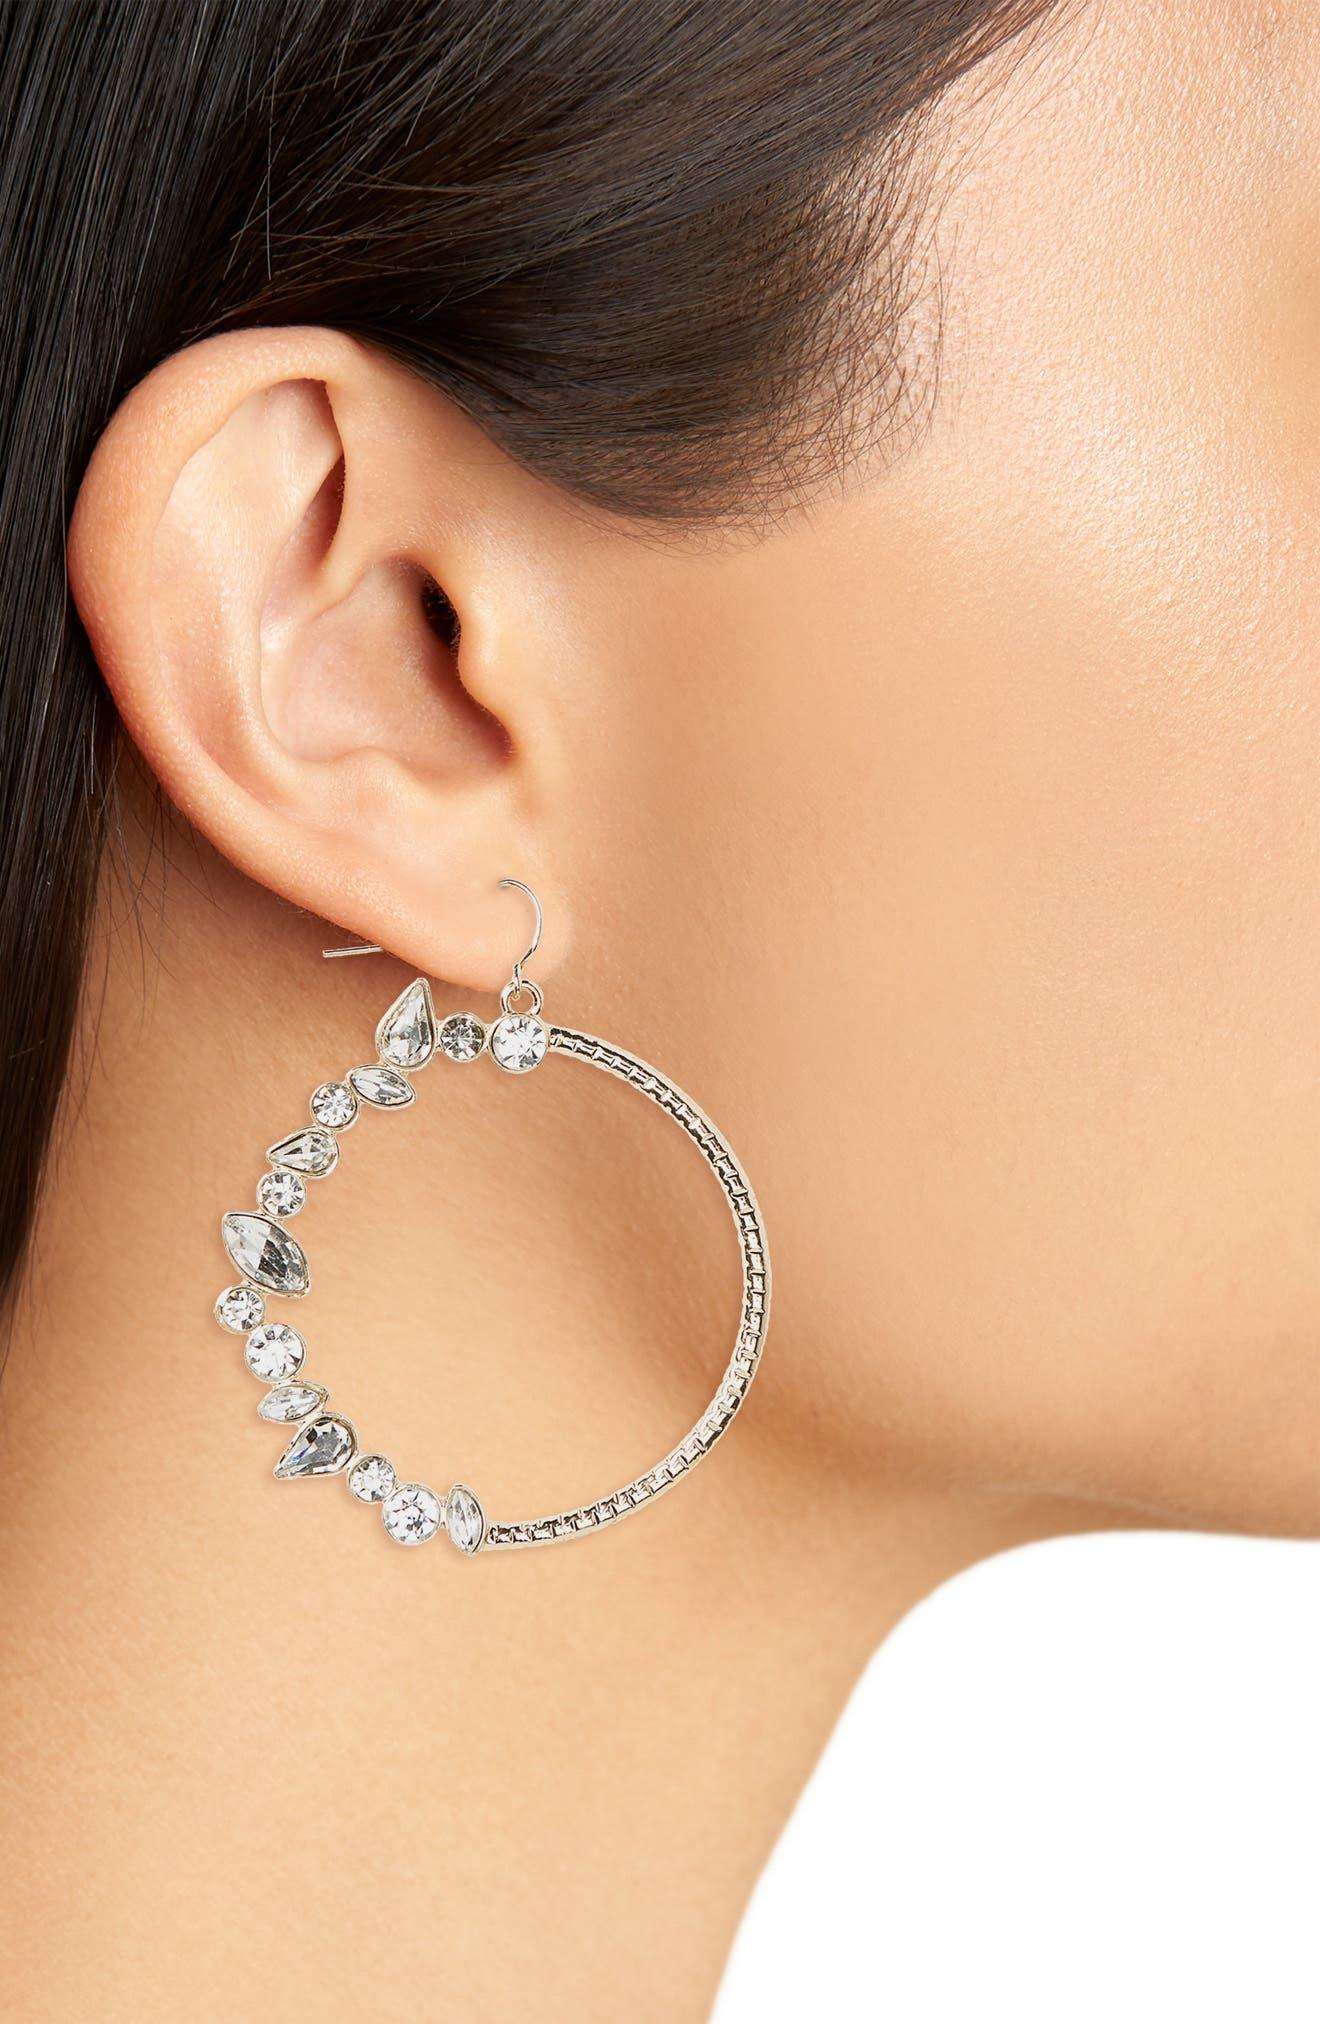 Natasha Crystal Hoop Earrings,                             Alternate thumbnail 2, color,                             710